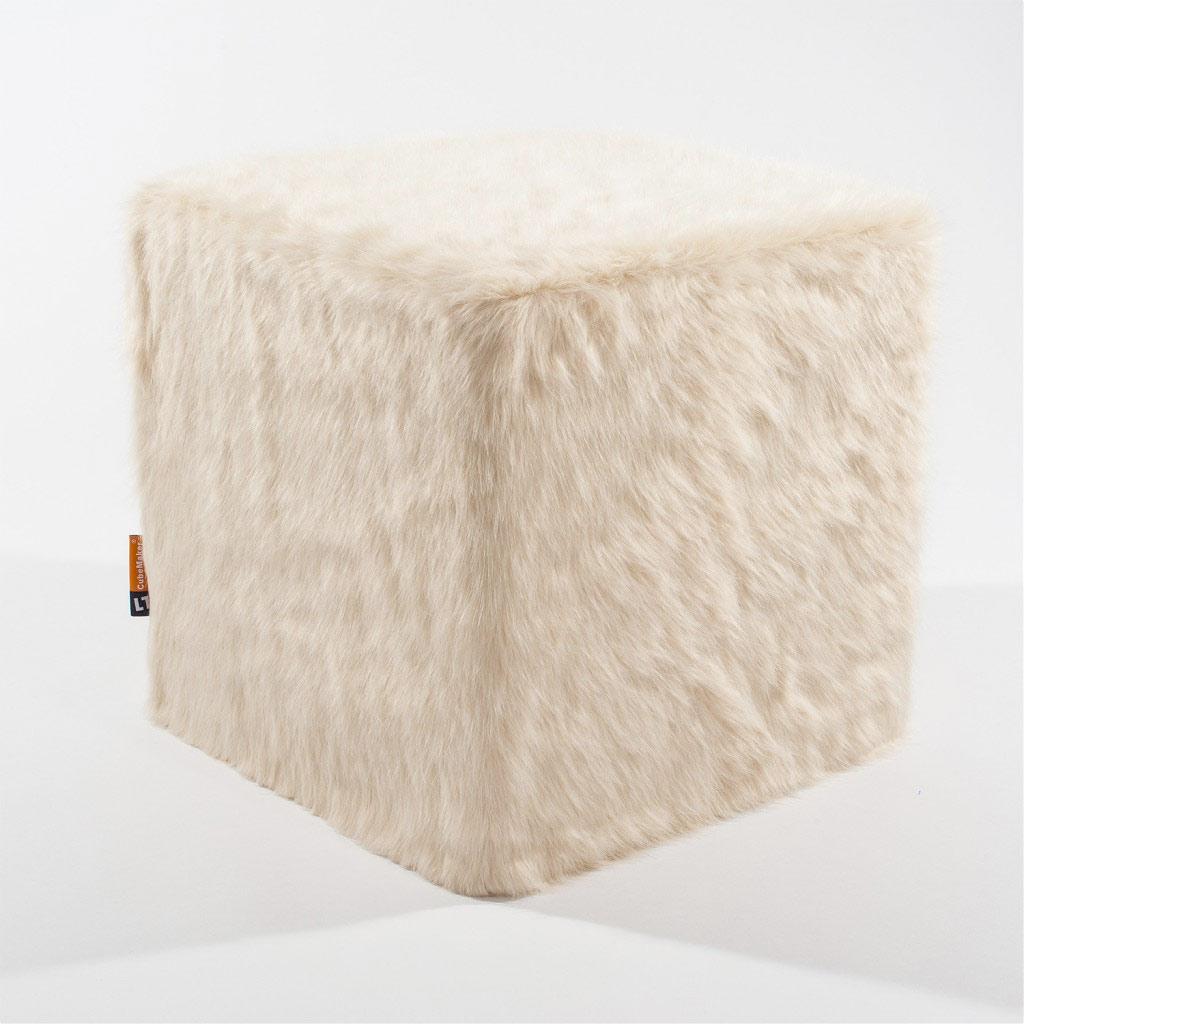 Sitzwürfel mit Kunstfell bezogen